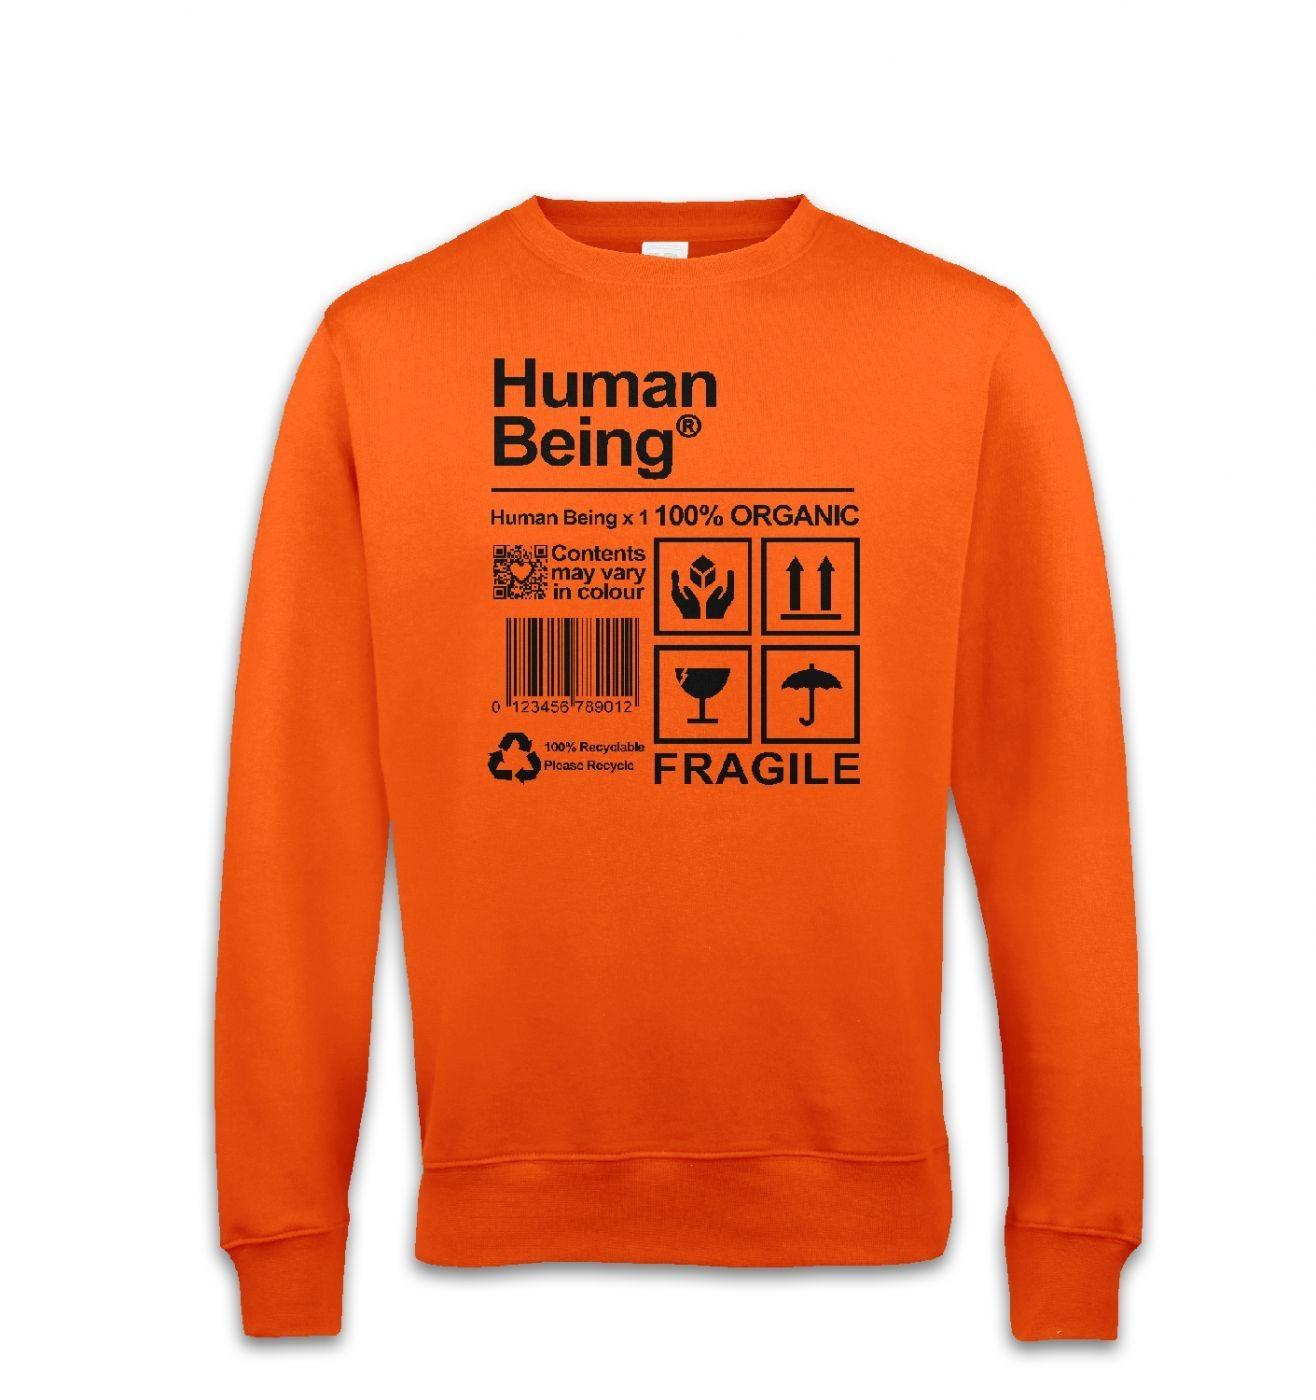 Human Being sweatshirt